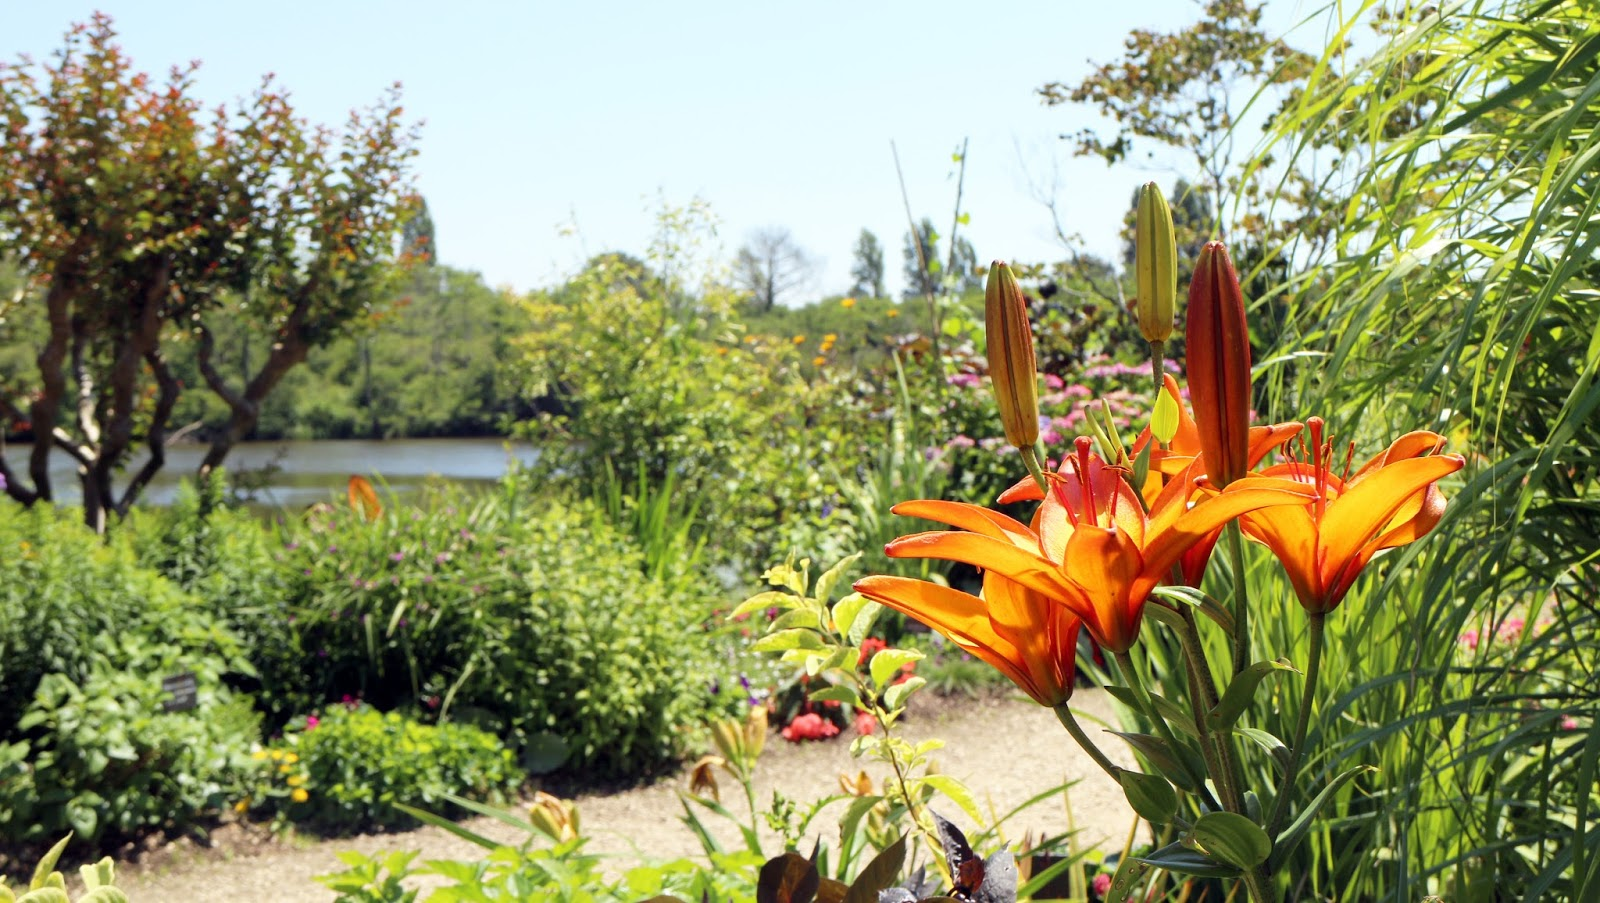 la promenade fleurie de mimizan | tukibomp - blog de bons plans